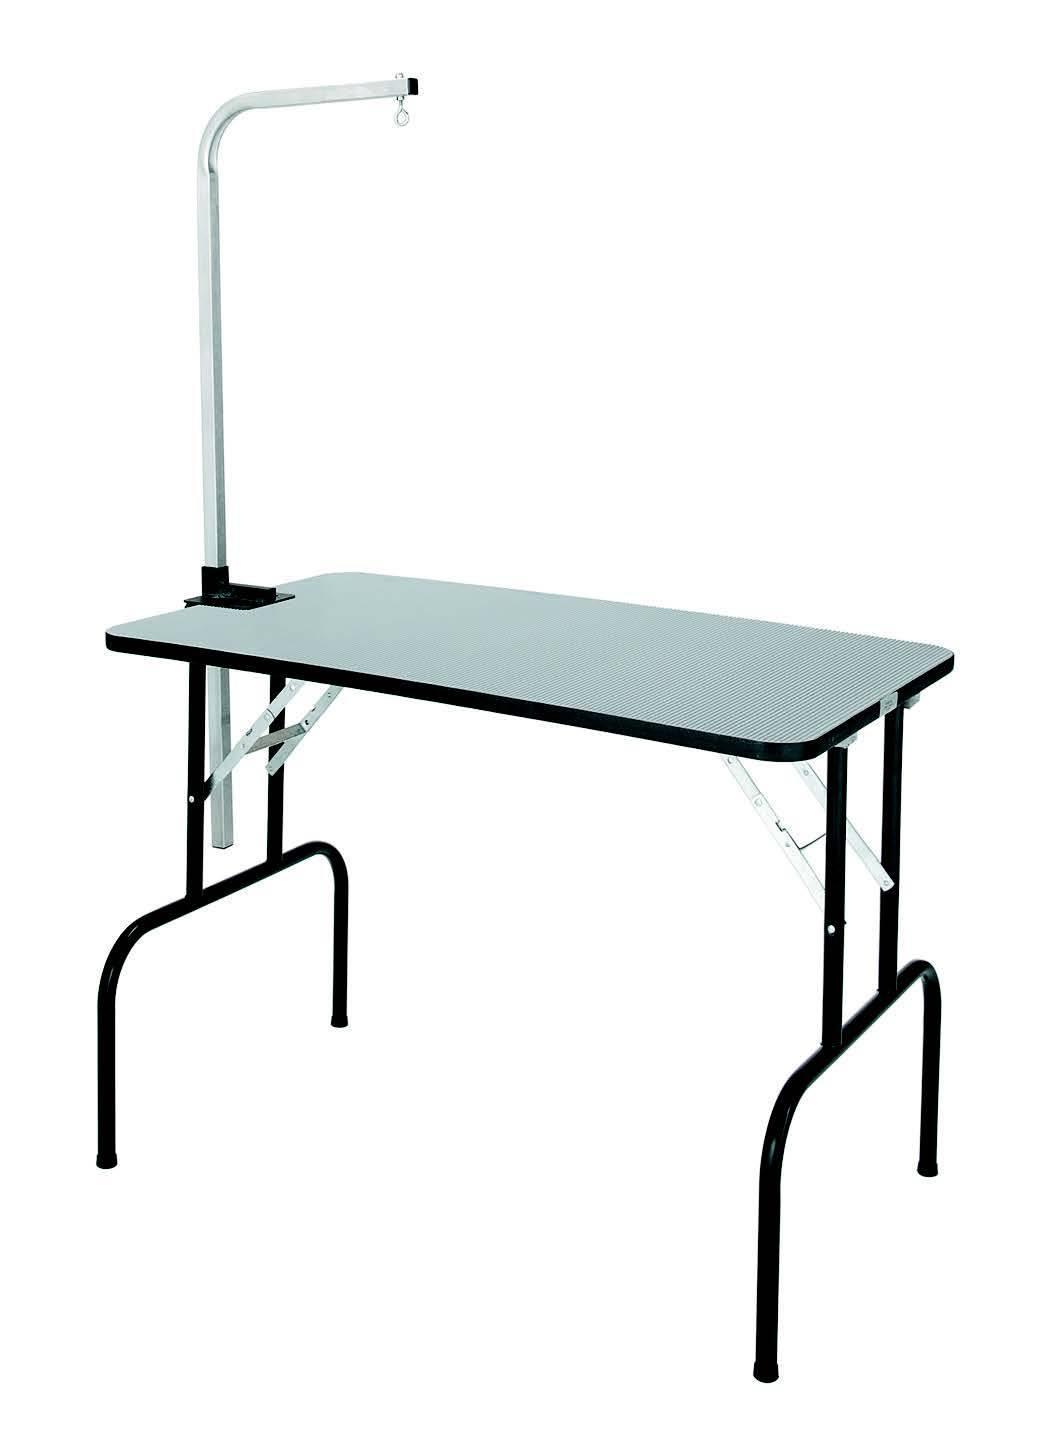 Folding 42u2033 Portable Standard Grooming Table